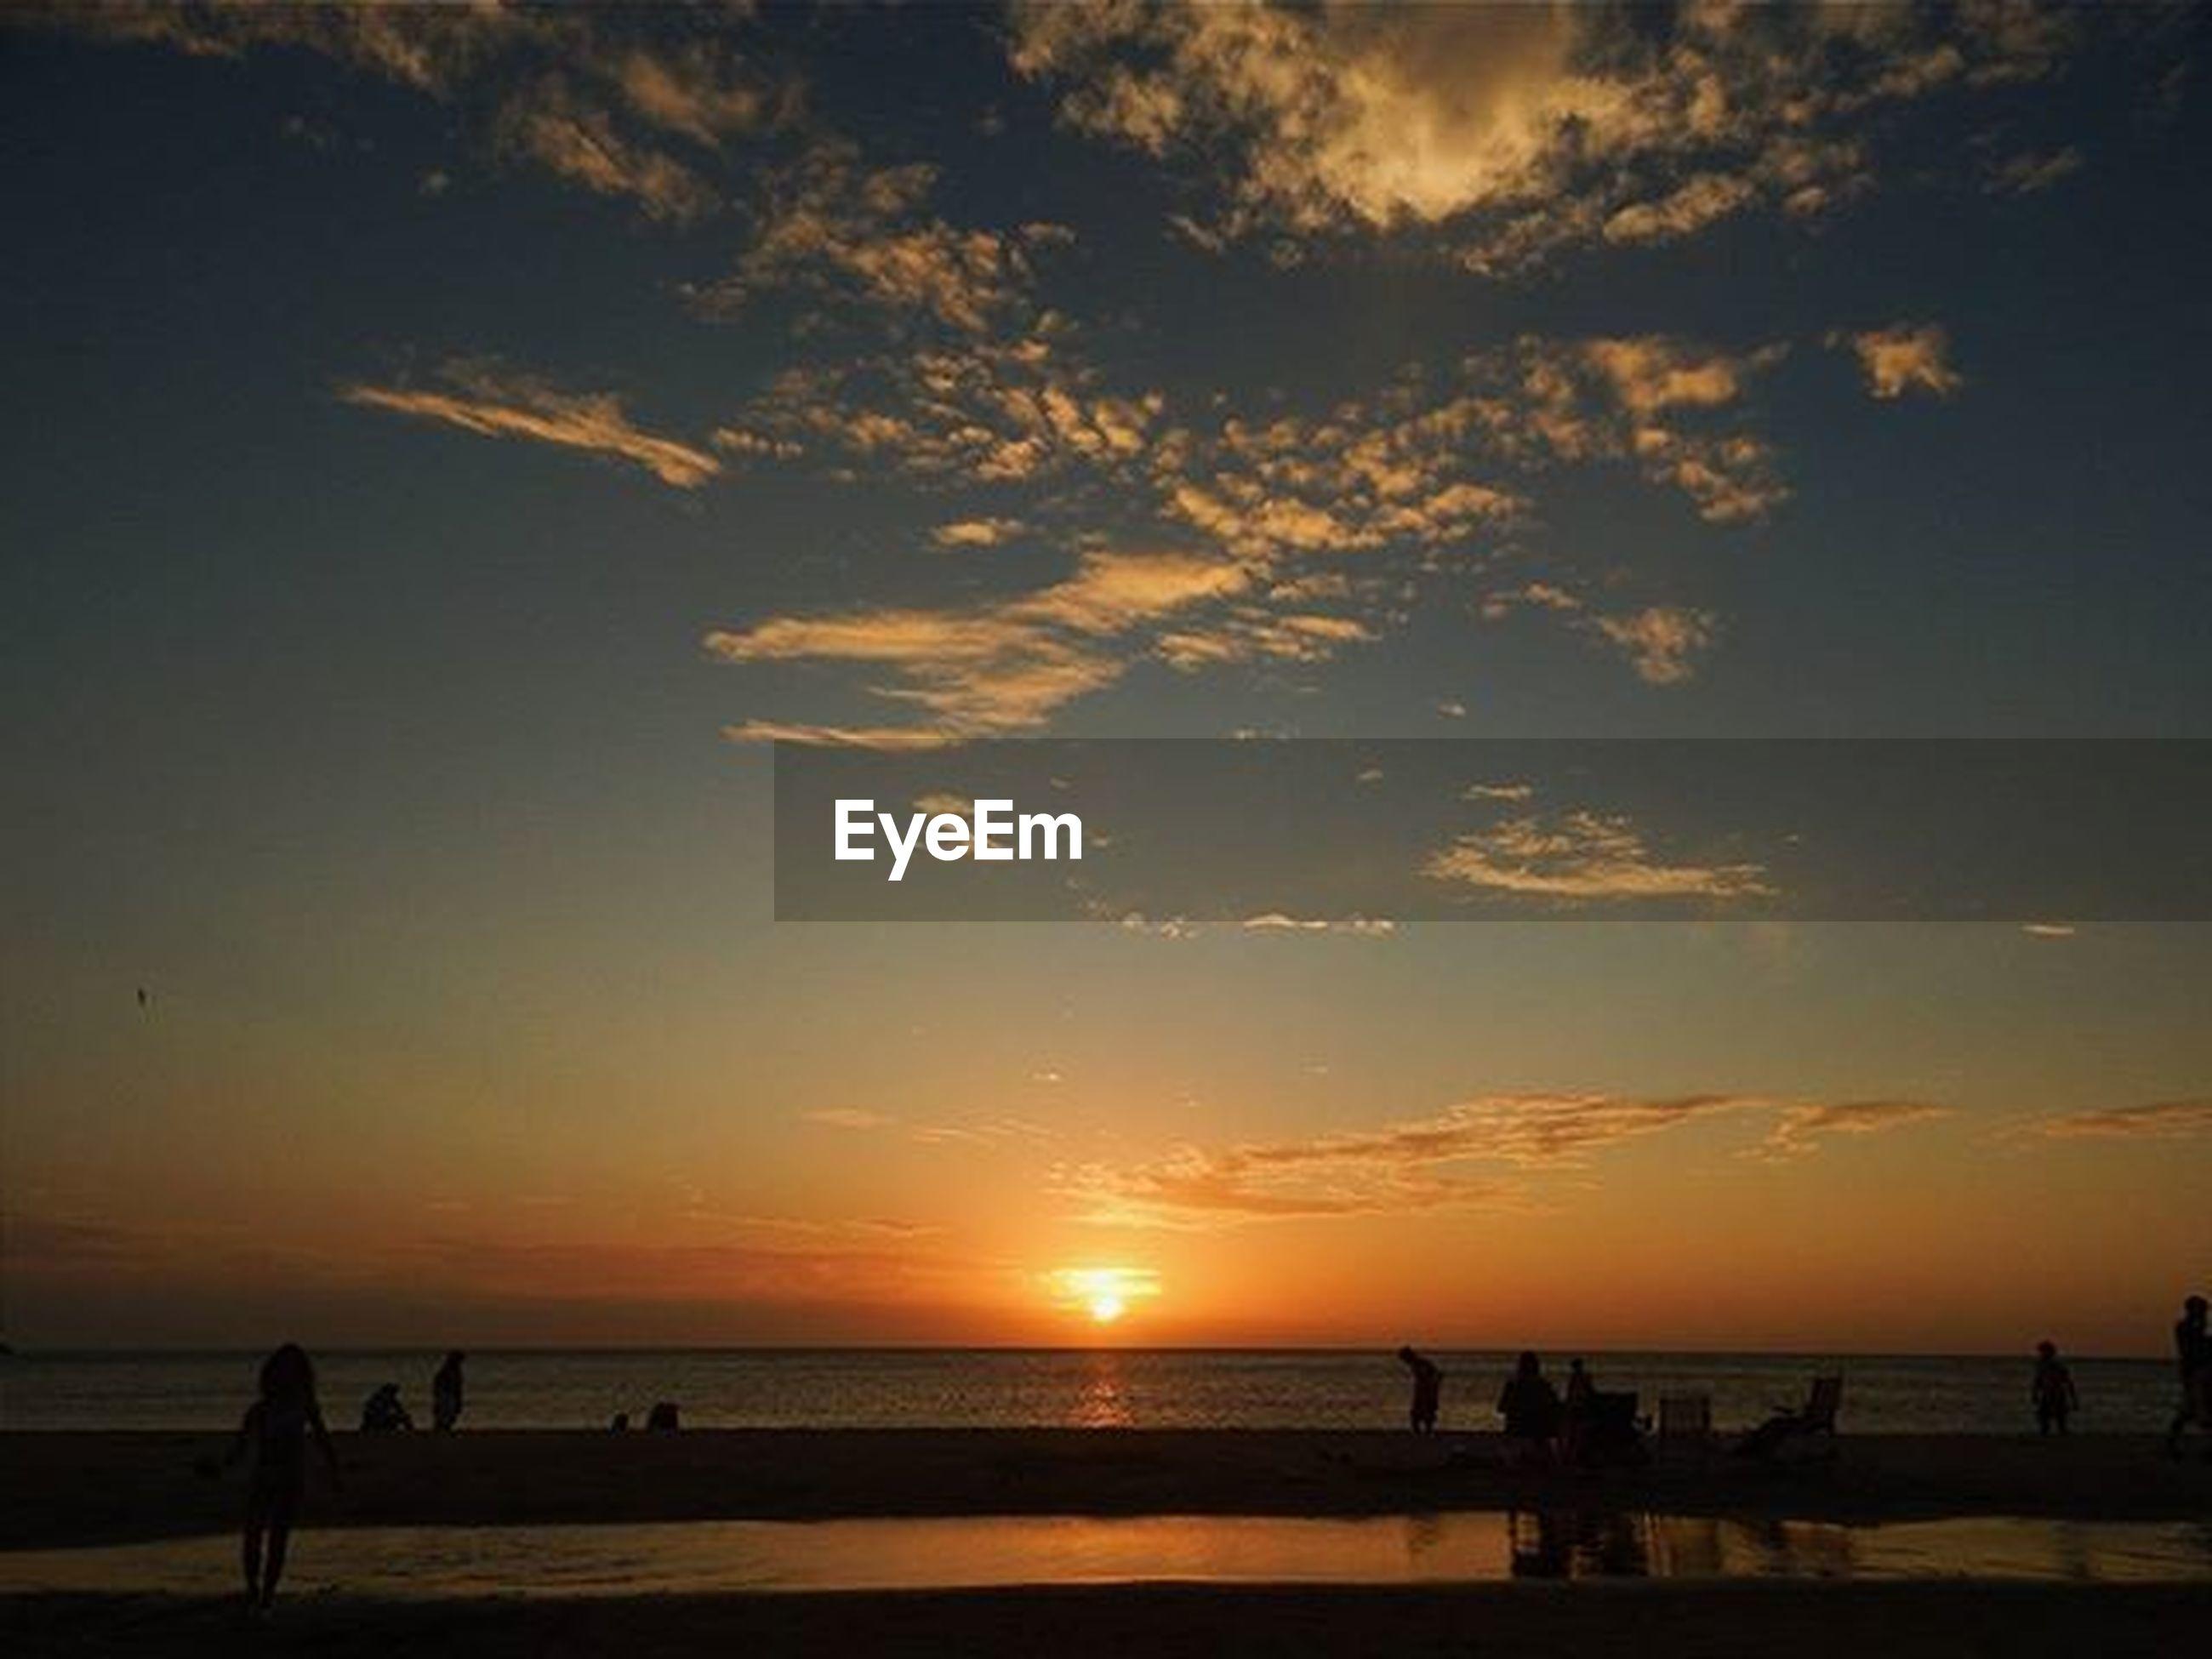 sunset, sea, horizon over water, water, scenics, silhouette, sun, beauty in nature, sky, tranquil scene, tranquility, orange color, idyllic, beach, nature, cloud - sky, sunlight, incidental people, cloud, shore